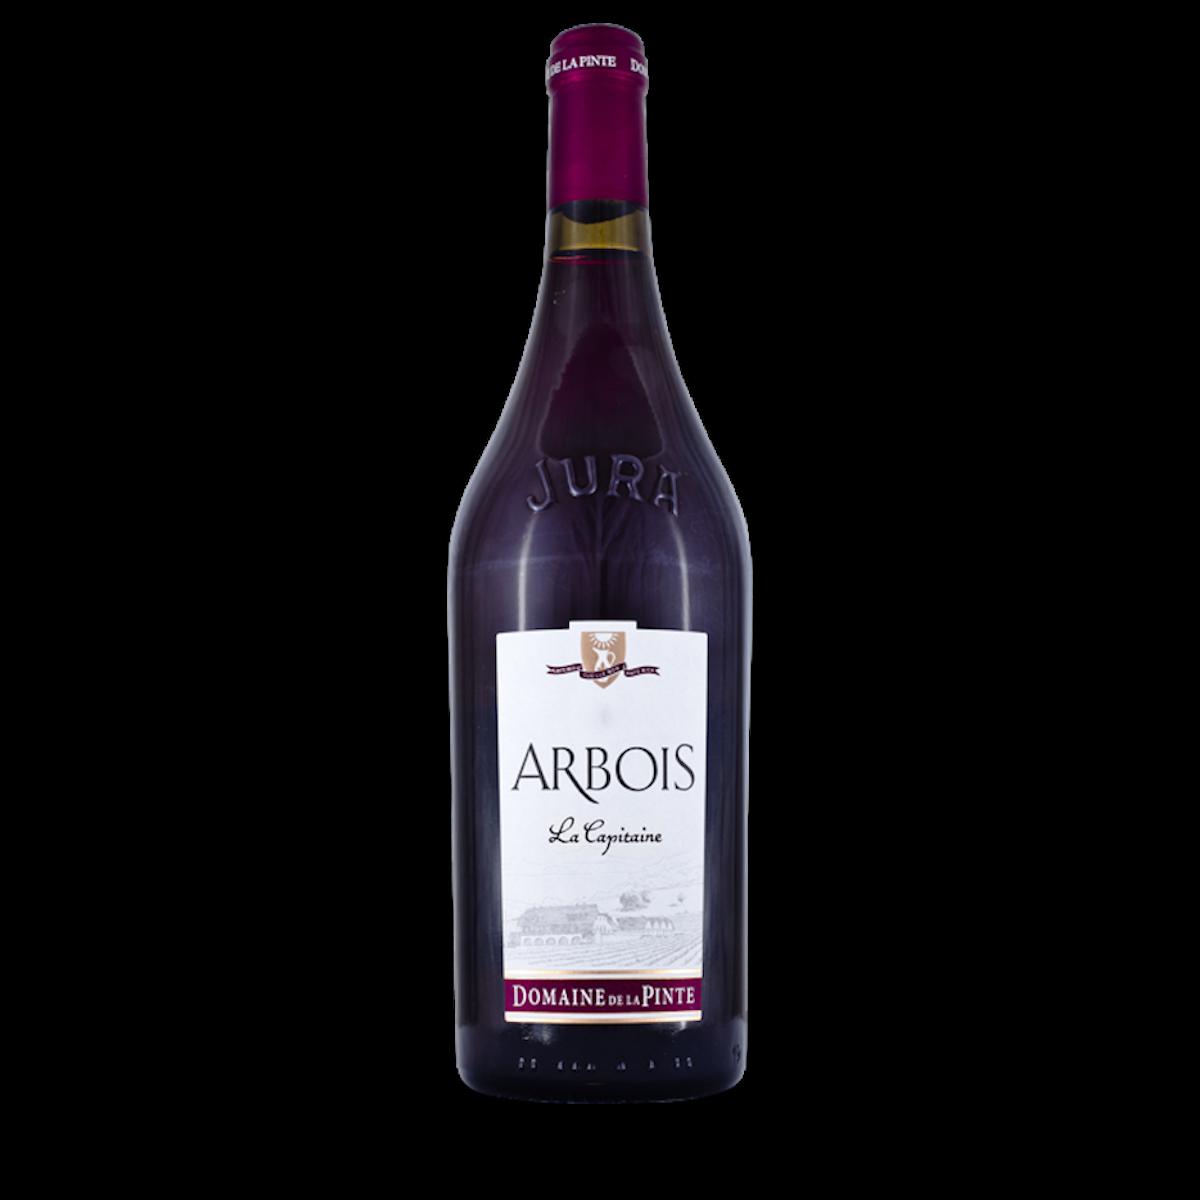 Arbois Rouge La Capitaine, 2018